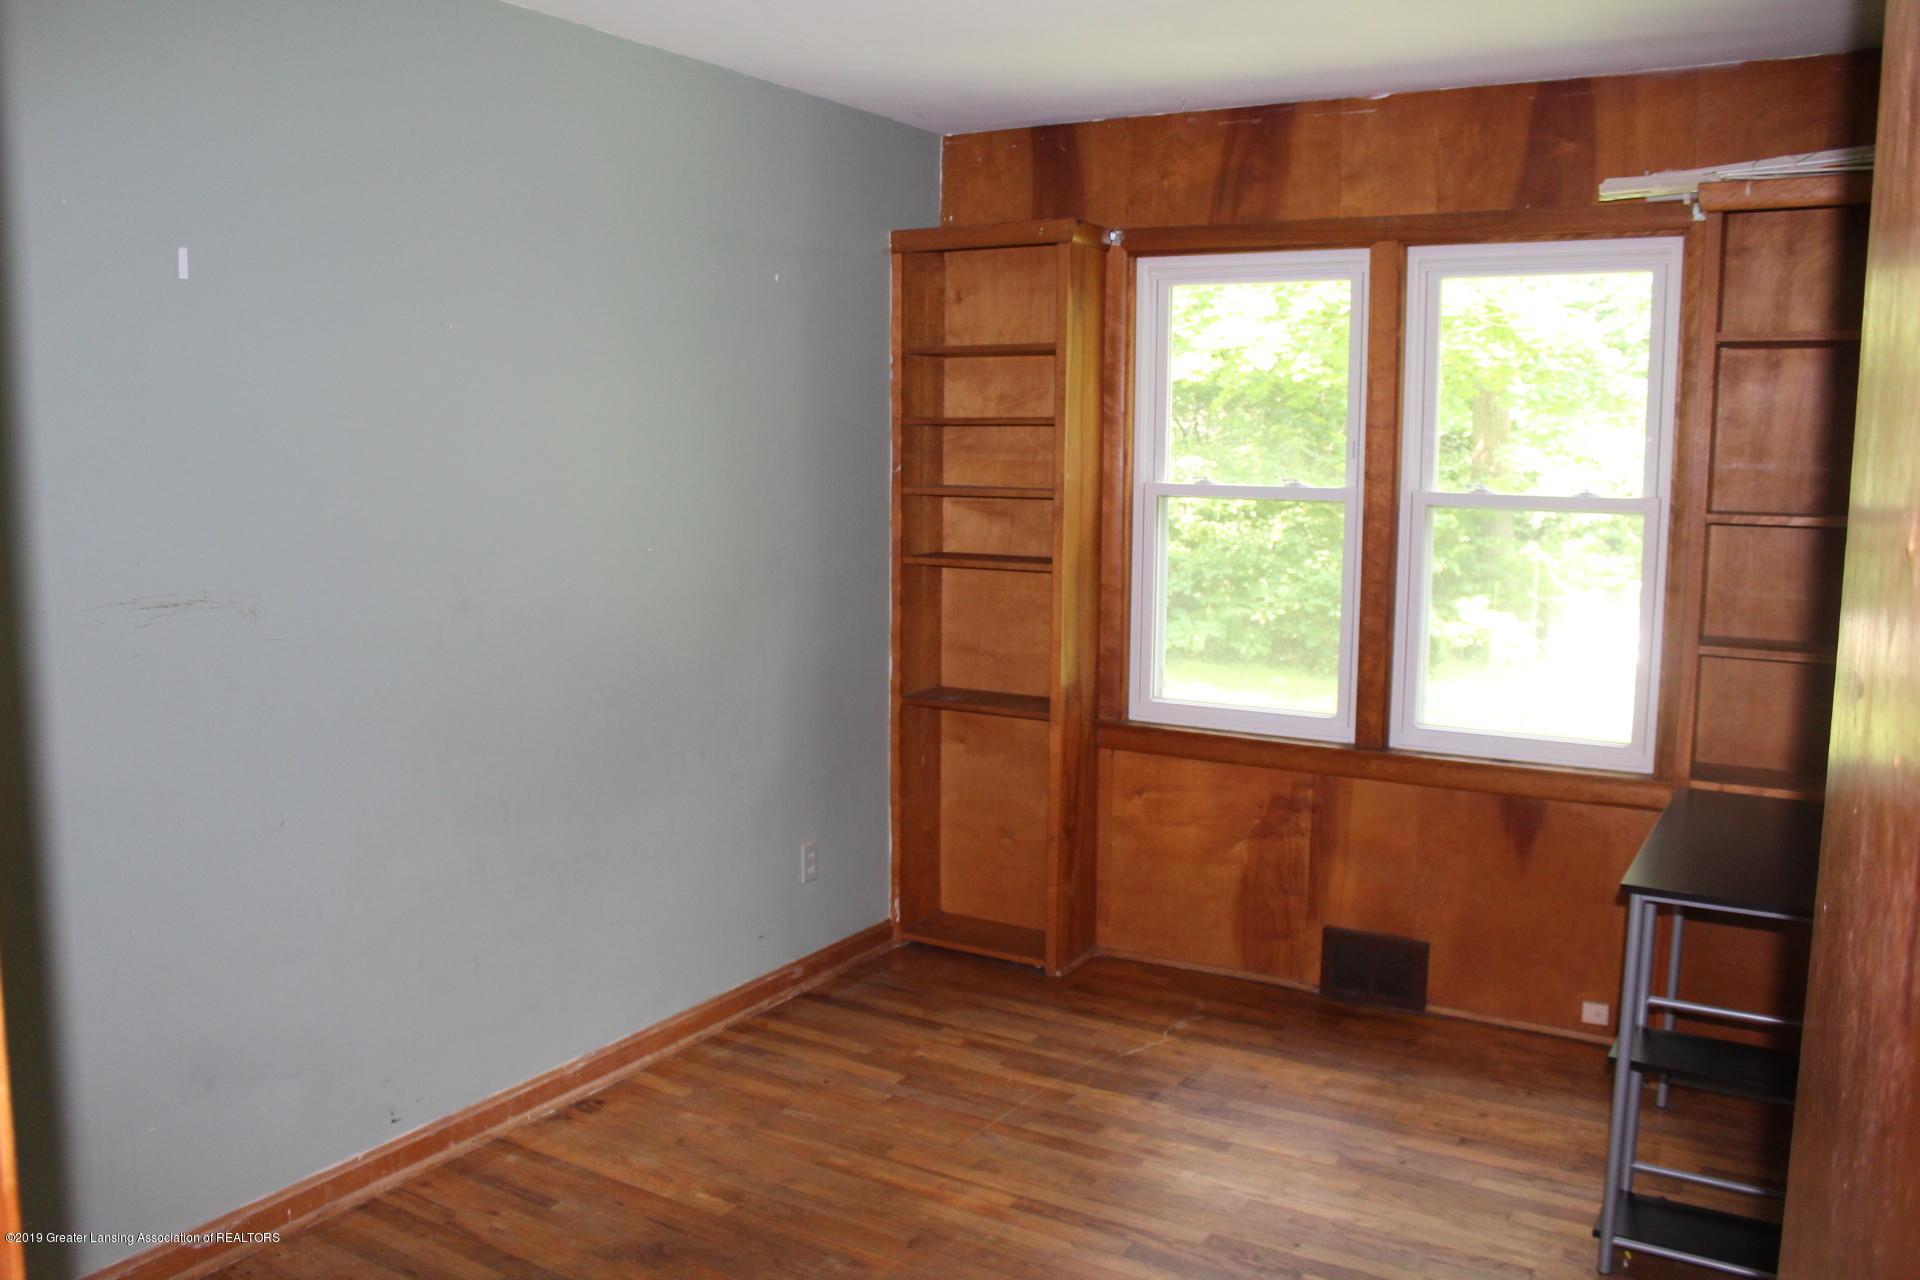 234 N Hagadorn Rd - Bedroom 2 - 7